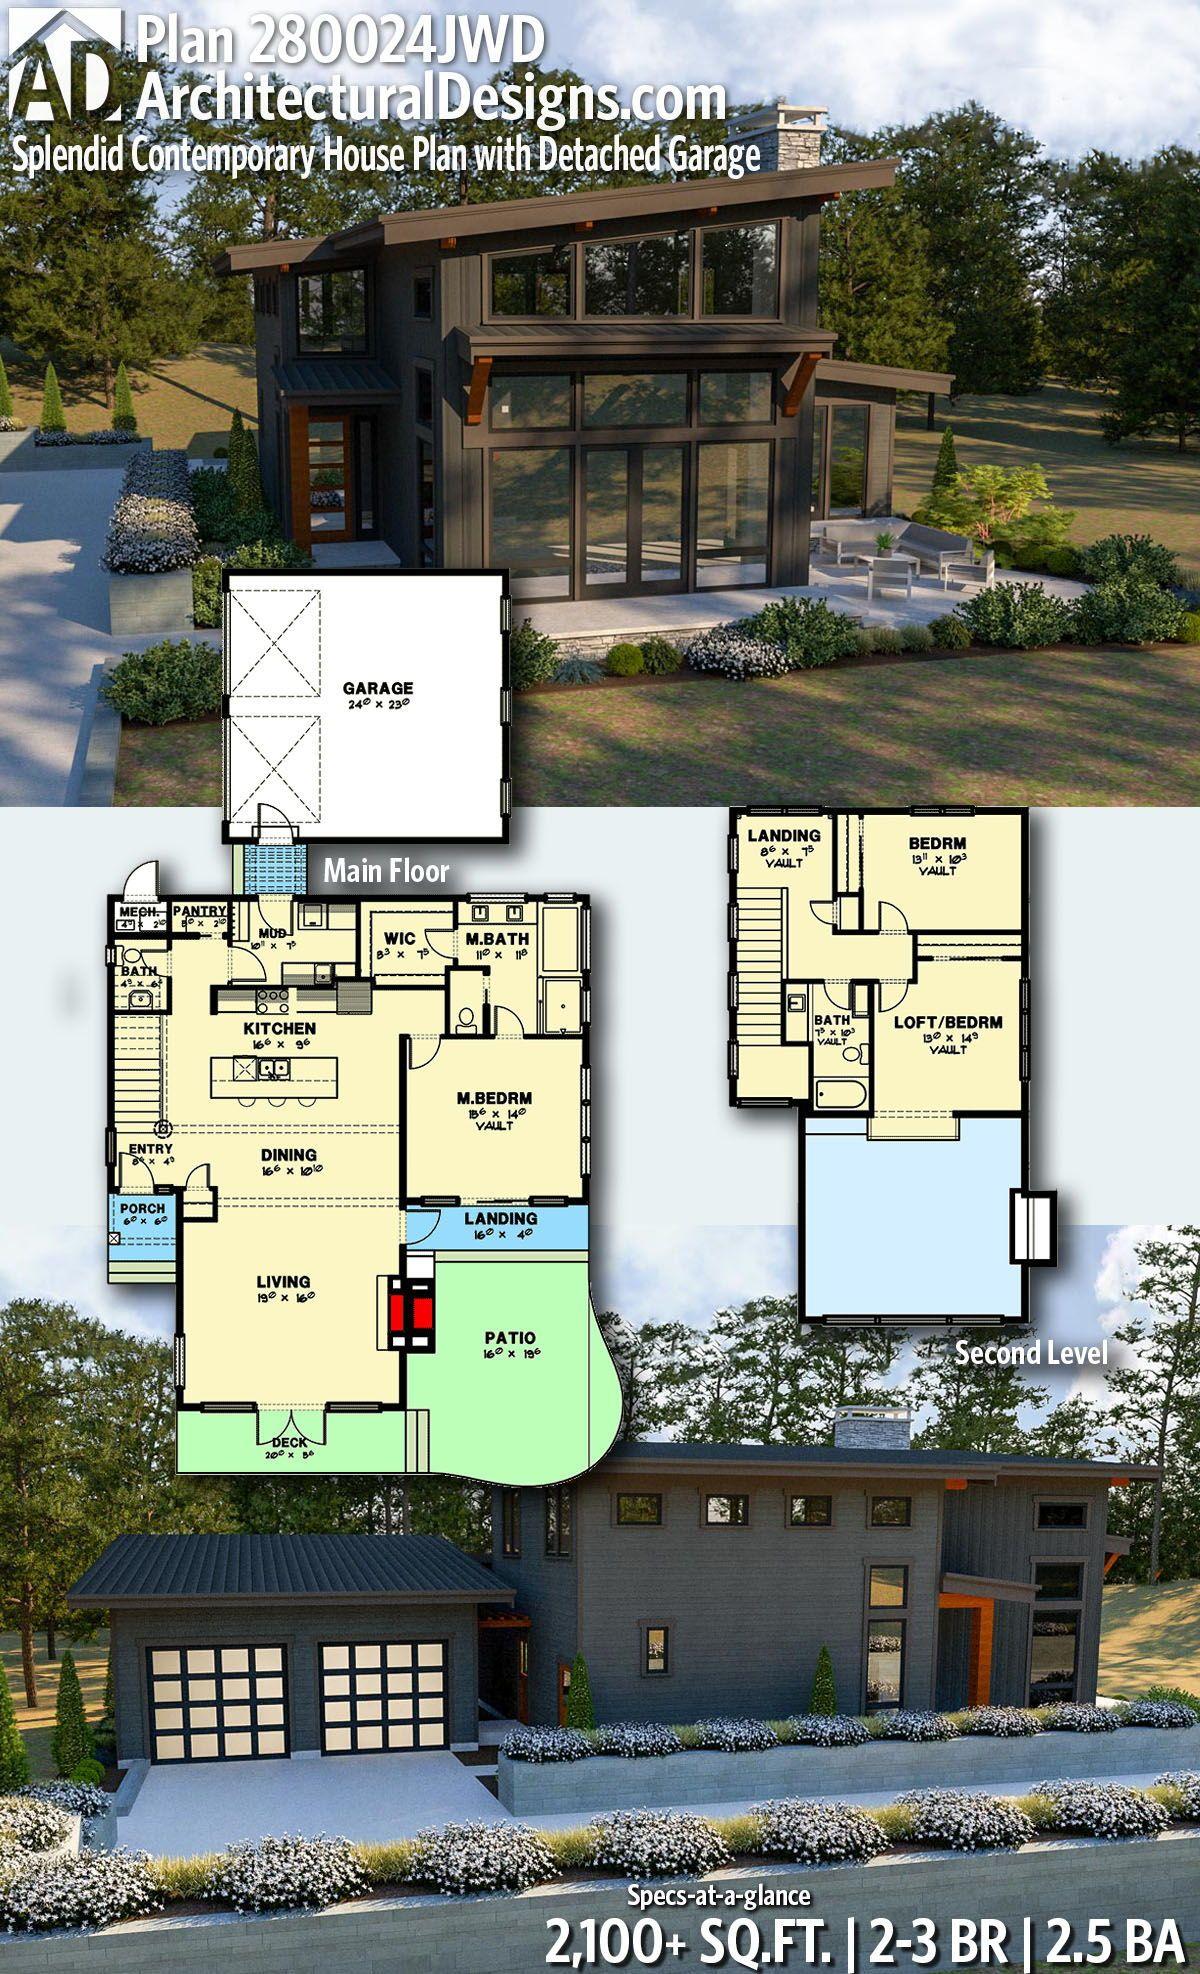 Plan 280024jwd Splendid Contemporary House Plan With Detached Garage Contemporary House Plans Contemporary House Dream House Plans